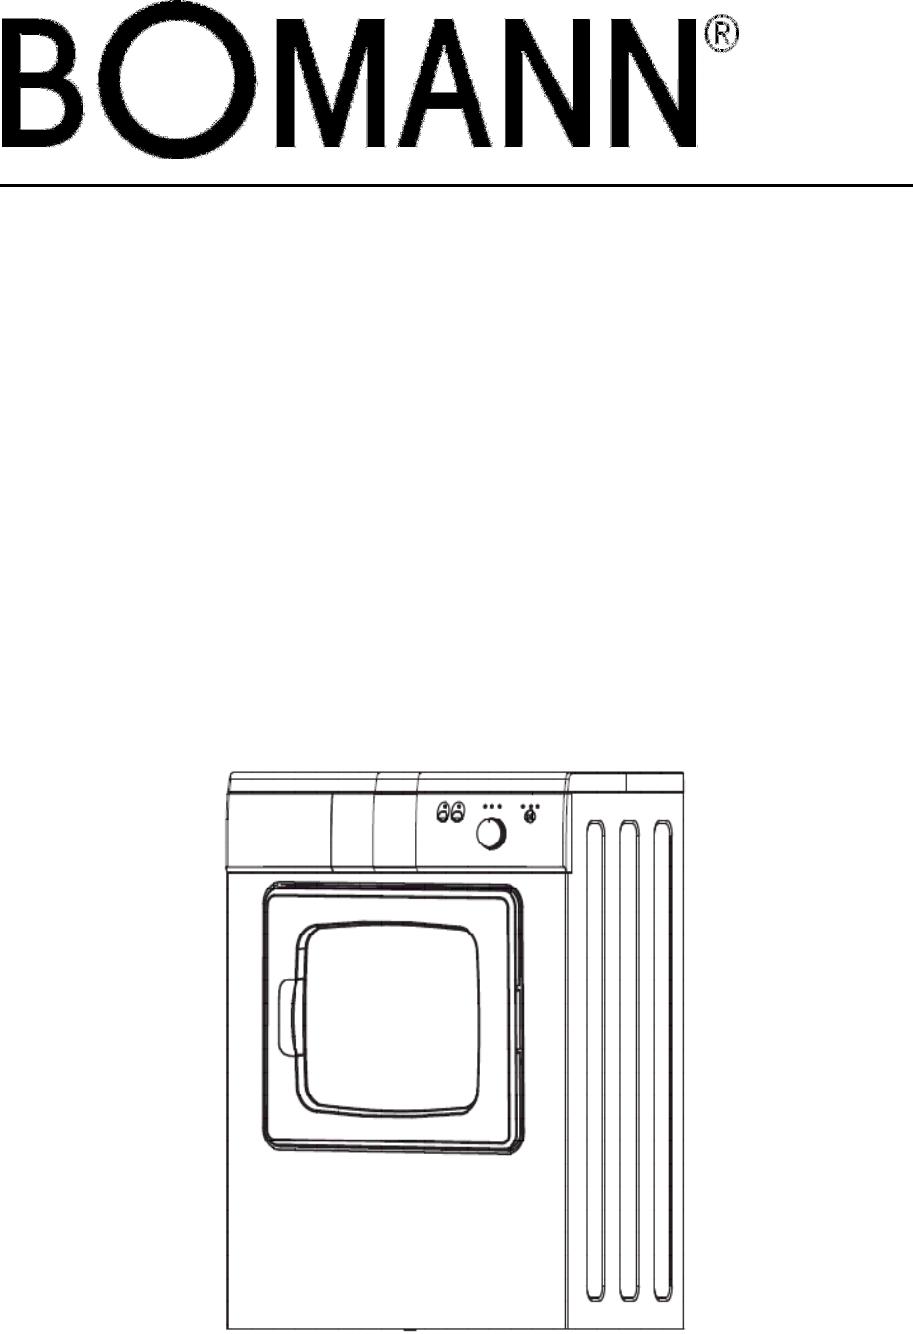 Bomann WT 5016 Bedienungsanleitung